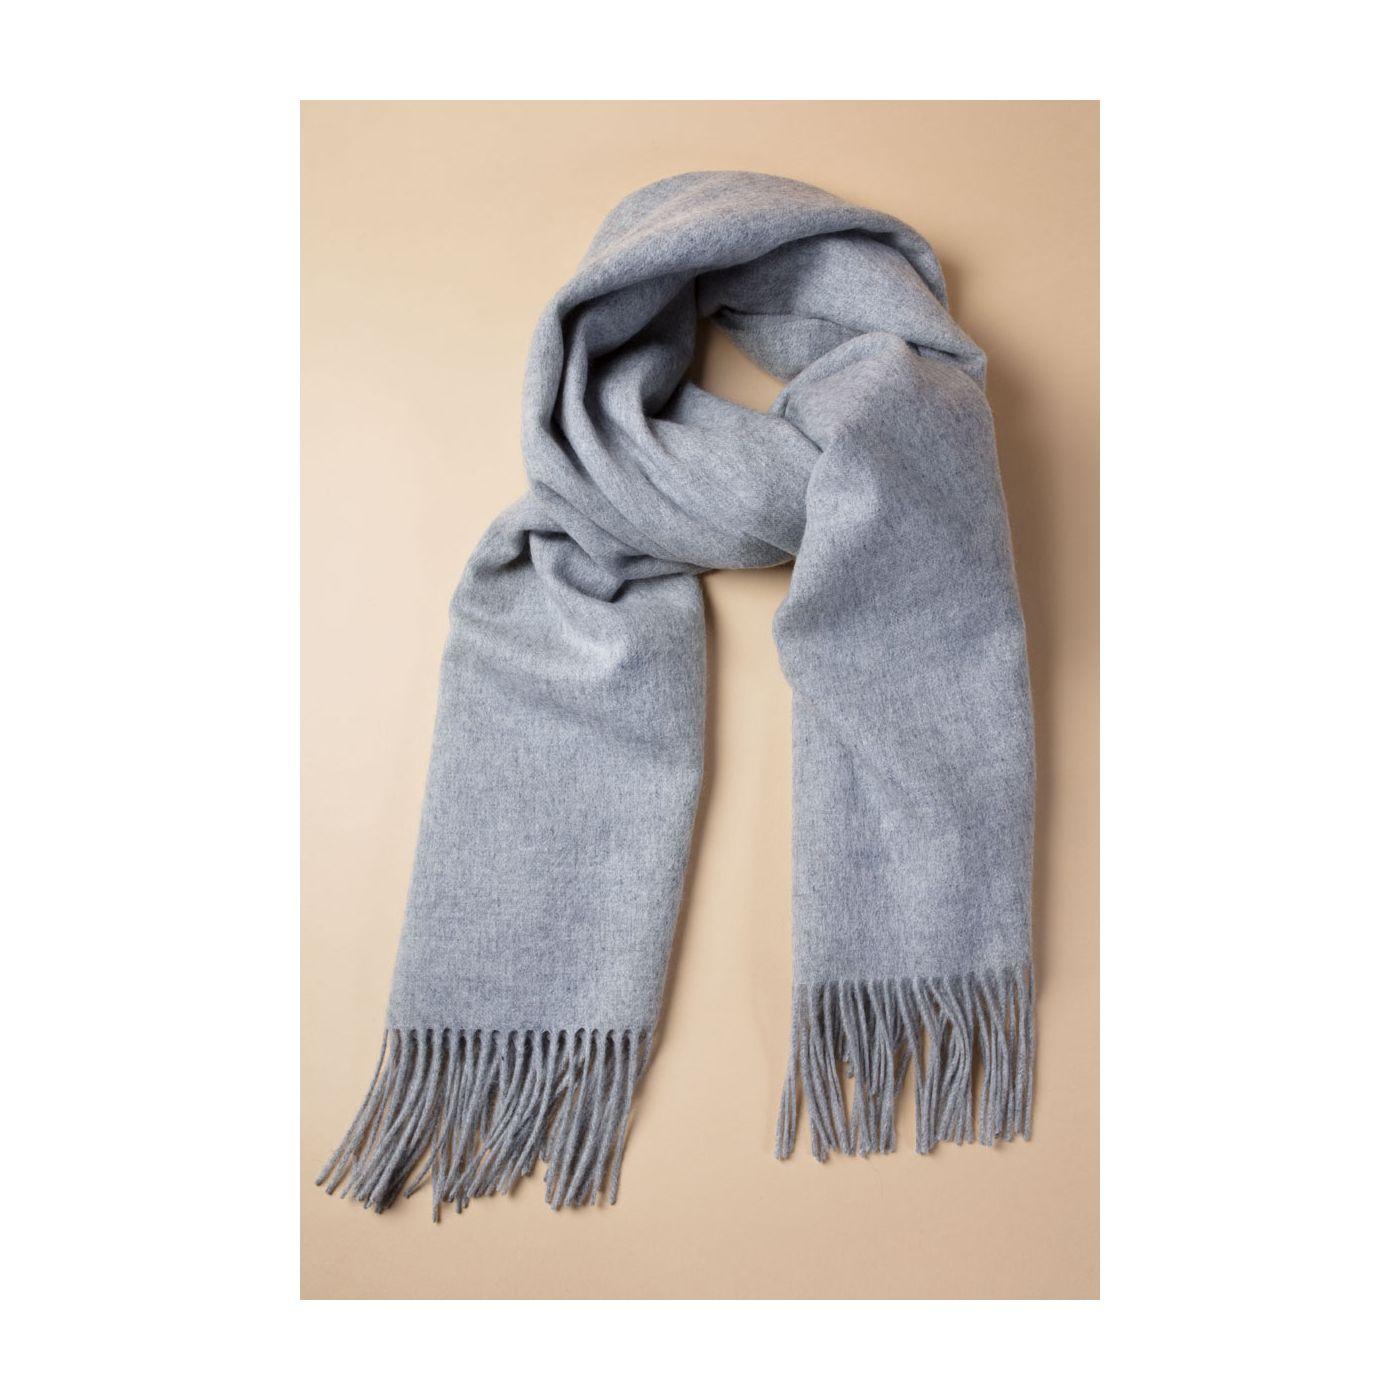 Scarf for men made of Merino wool in Light grey